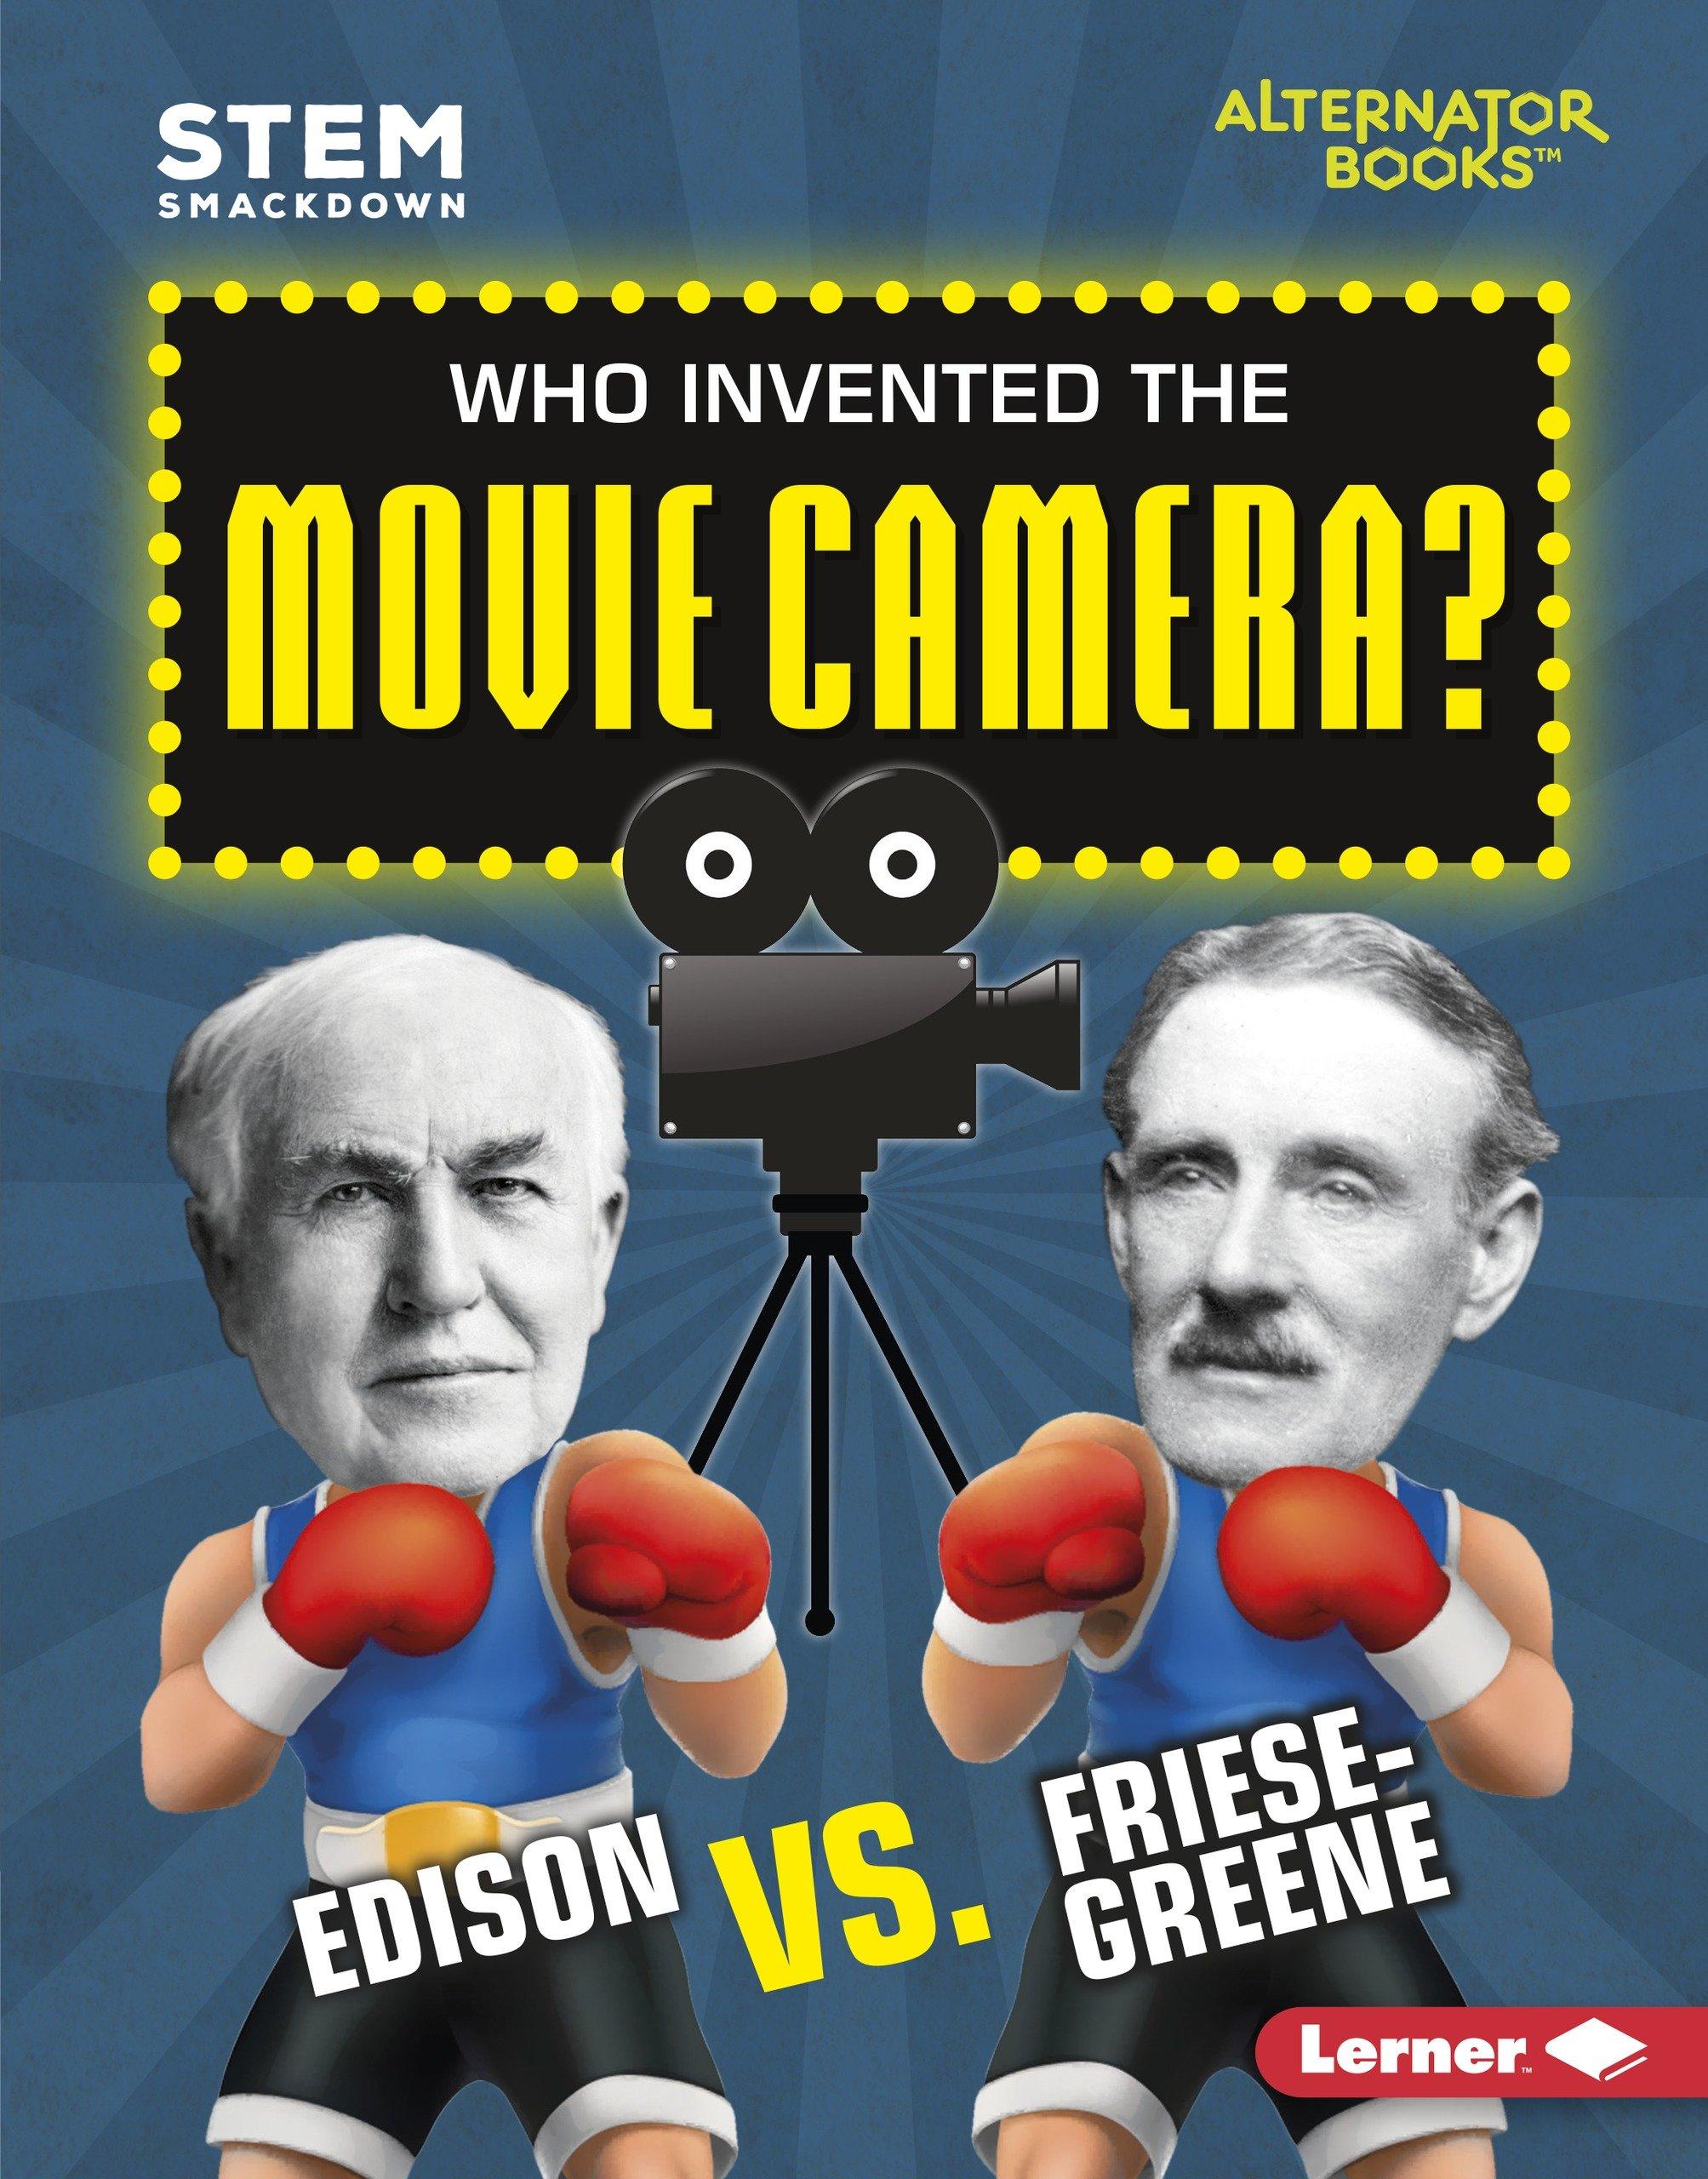 Who Invented the Movie Camera?: Edison Vs. Friese-Greene (STEM: Smackdown)